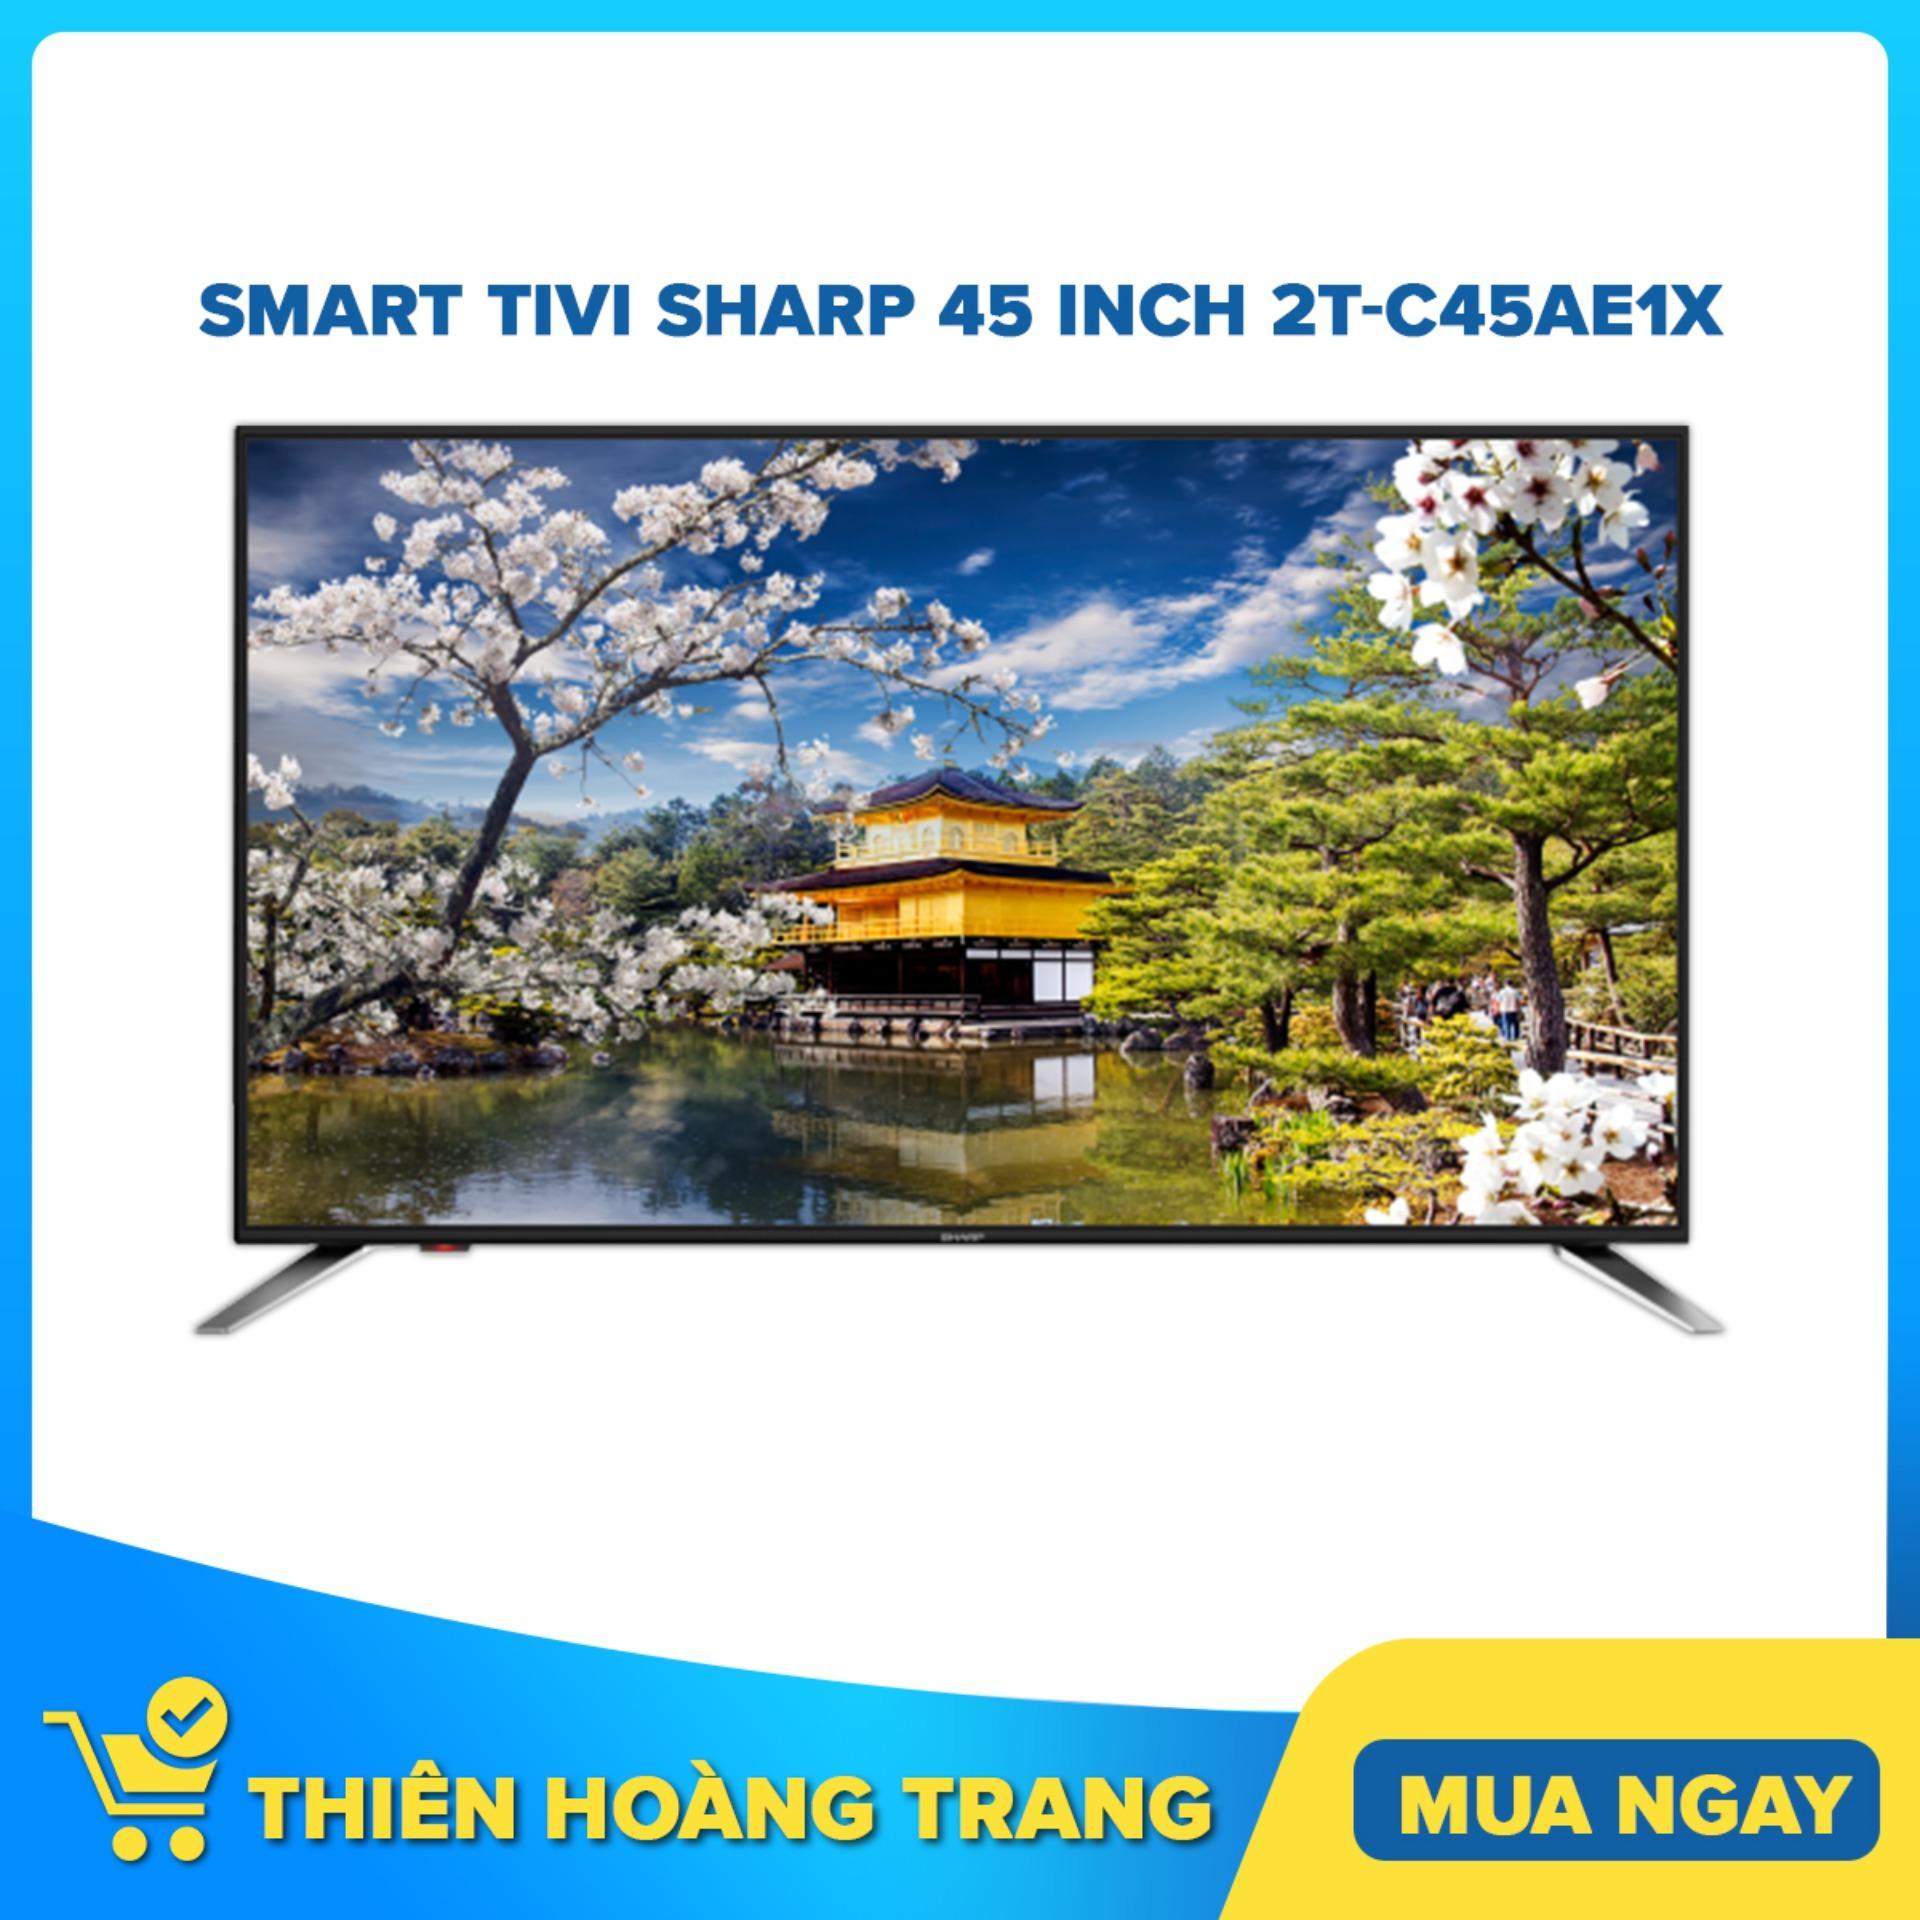 Bảng giá Smart Tivi Sharp 45 inch 2T-C45AE1X